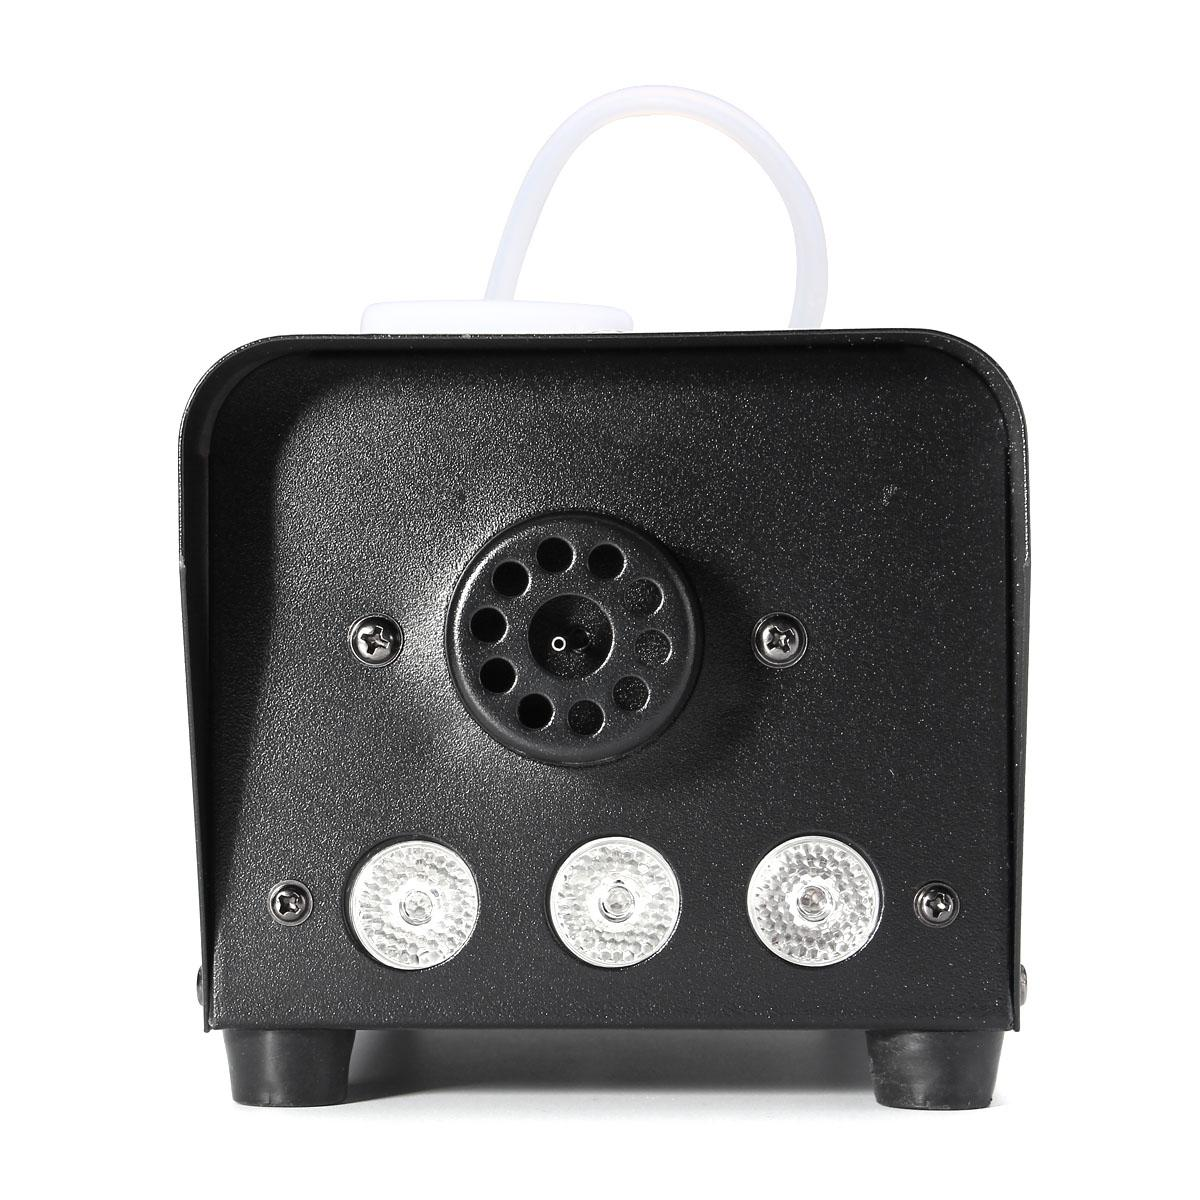 500W Professional Smoke Ejector Fog Machine RGB LED Night Light Stage Lighting Effect Remote Controller DJ Party KTV Bar Show